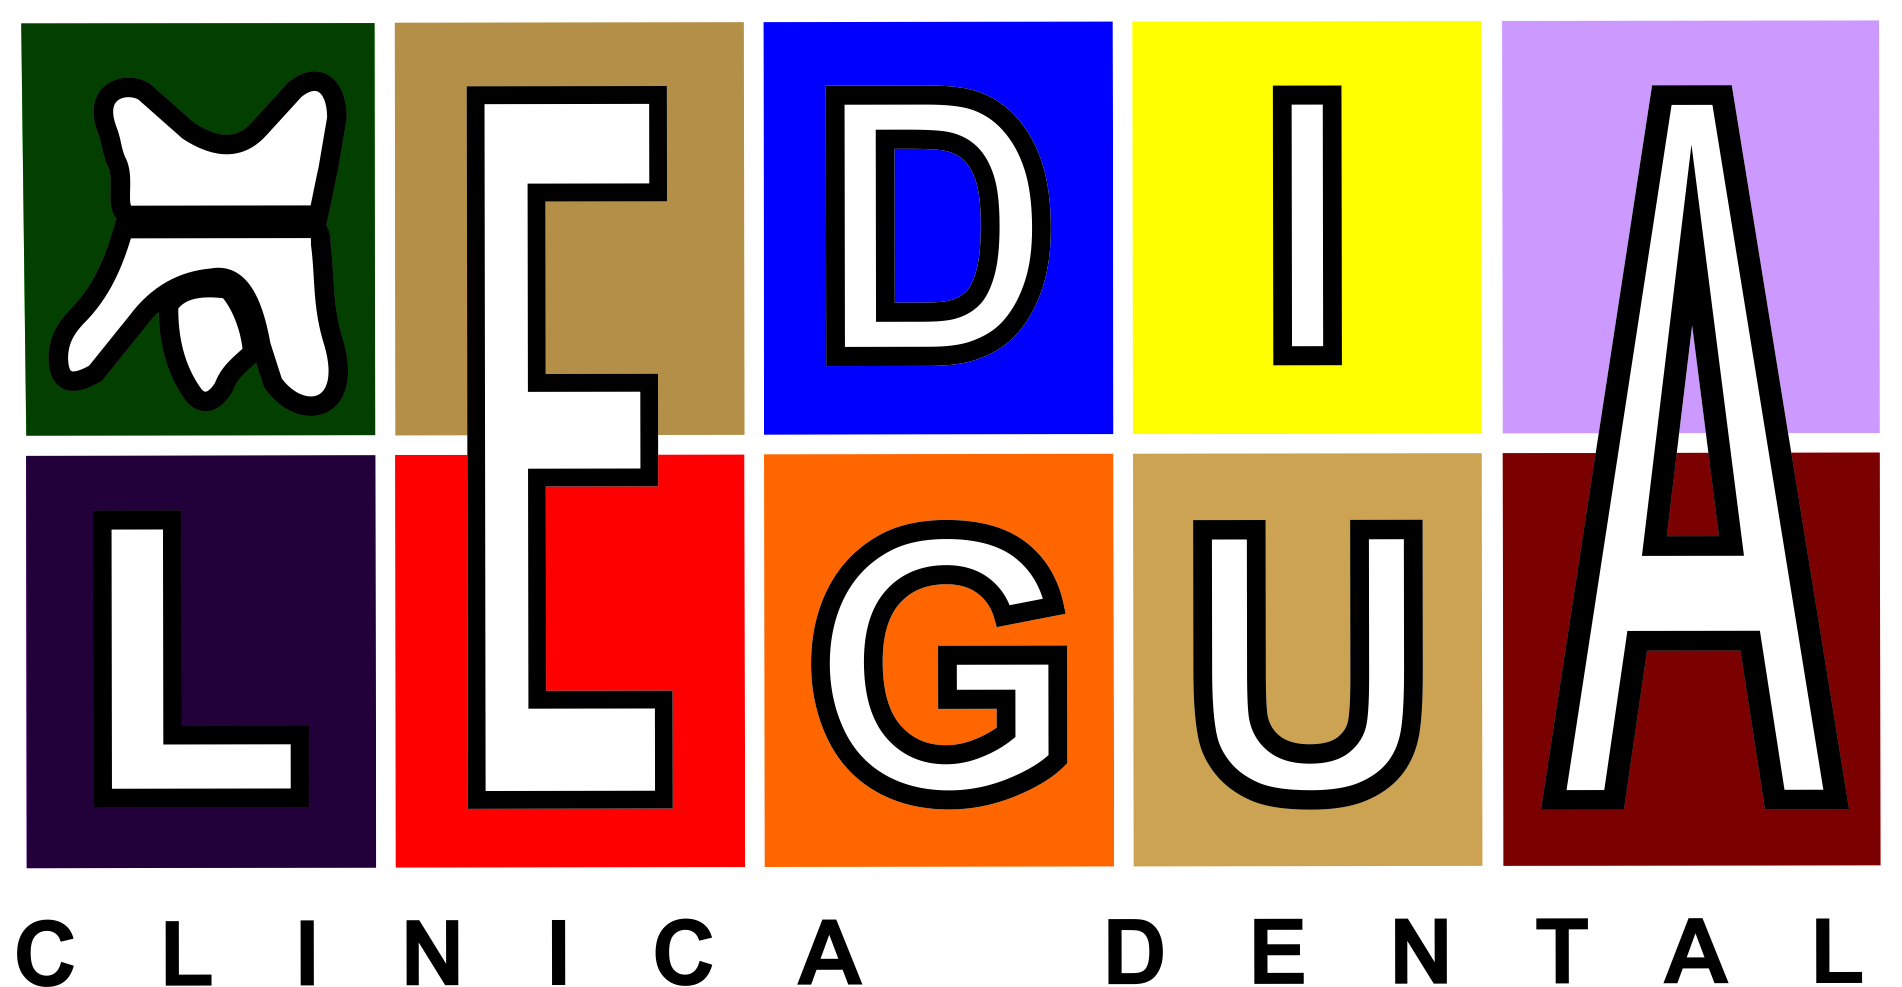 CLINICA DENTAL MEDIA LEGUA